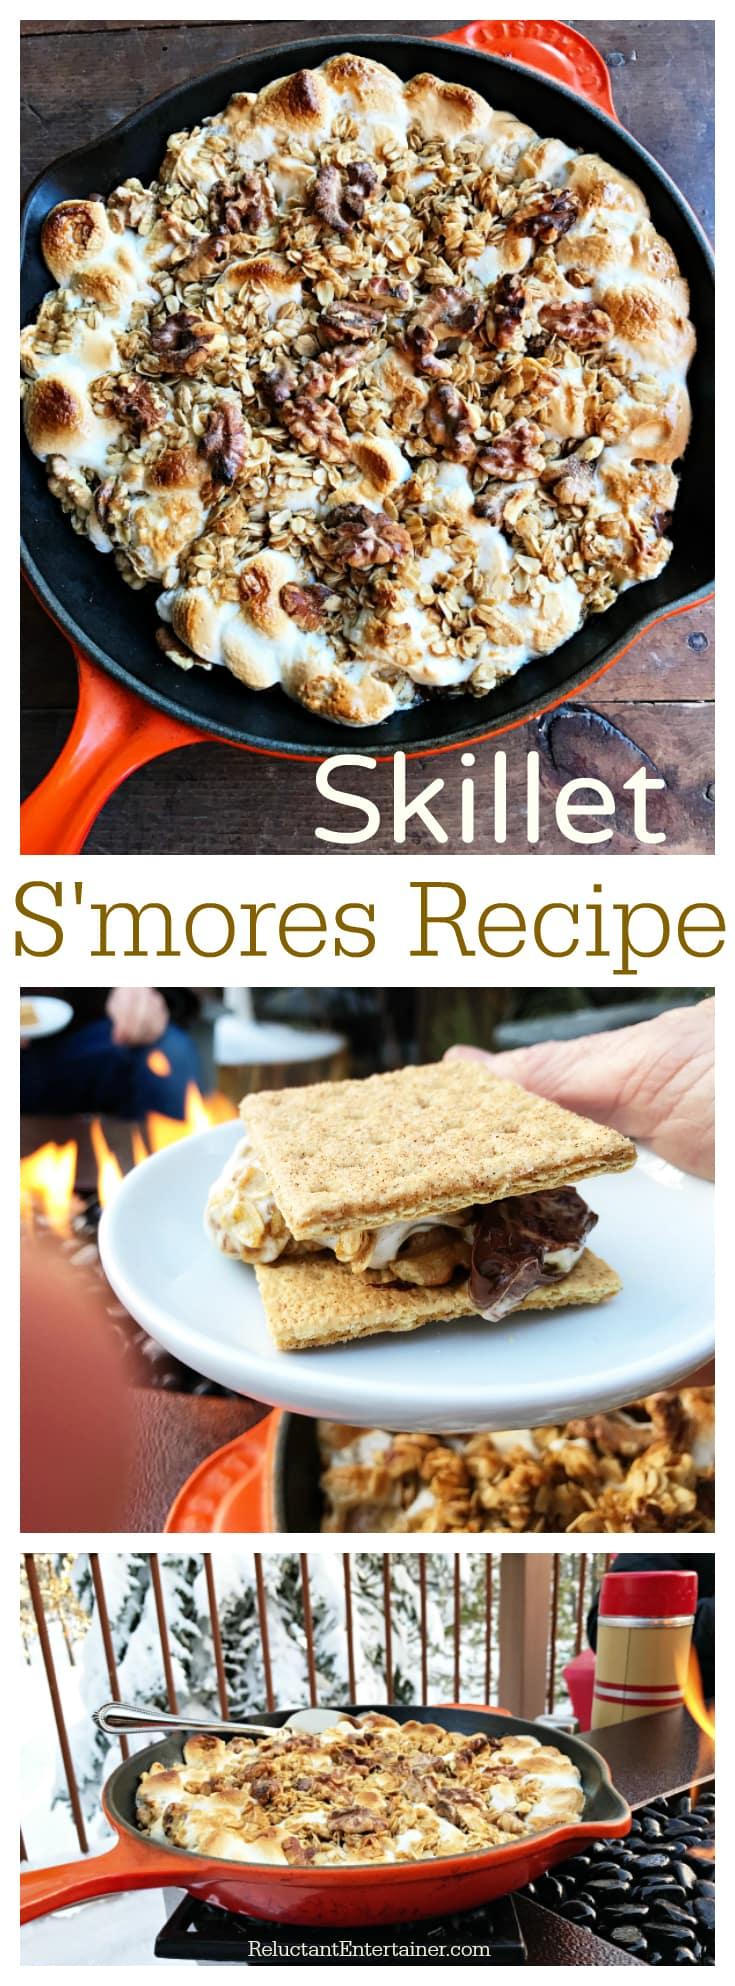 Skillet S'mores Recipe